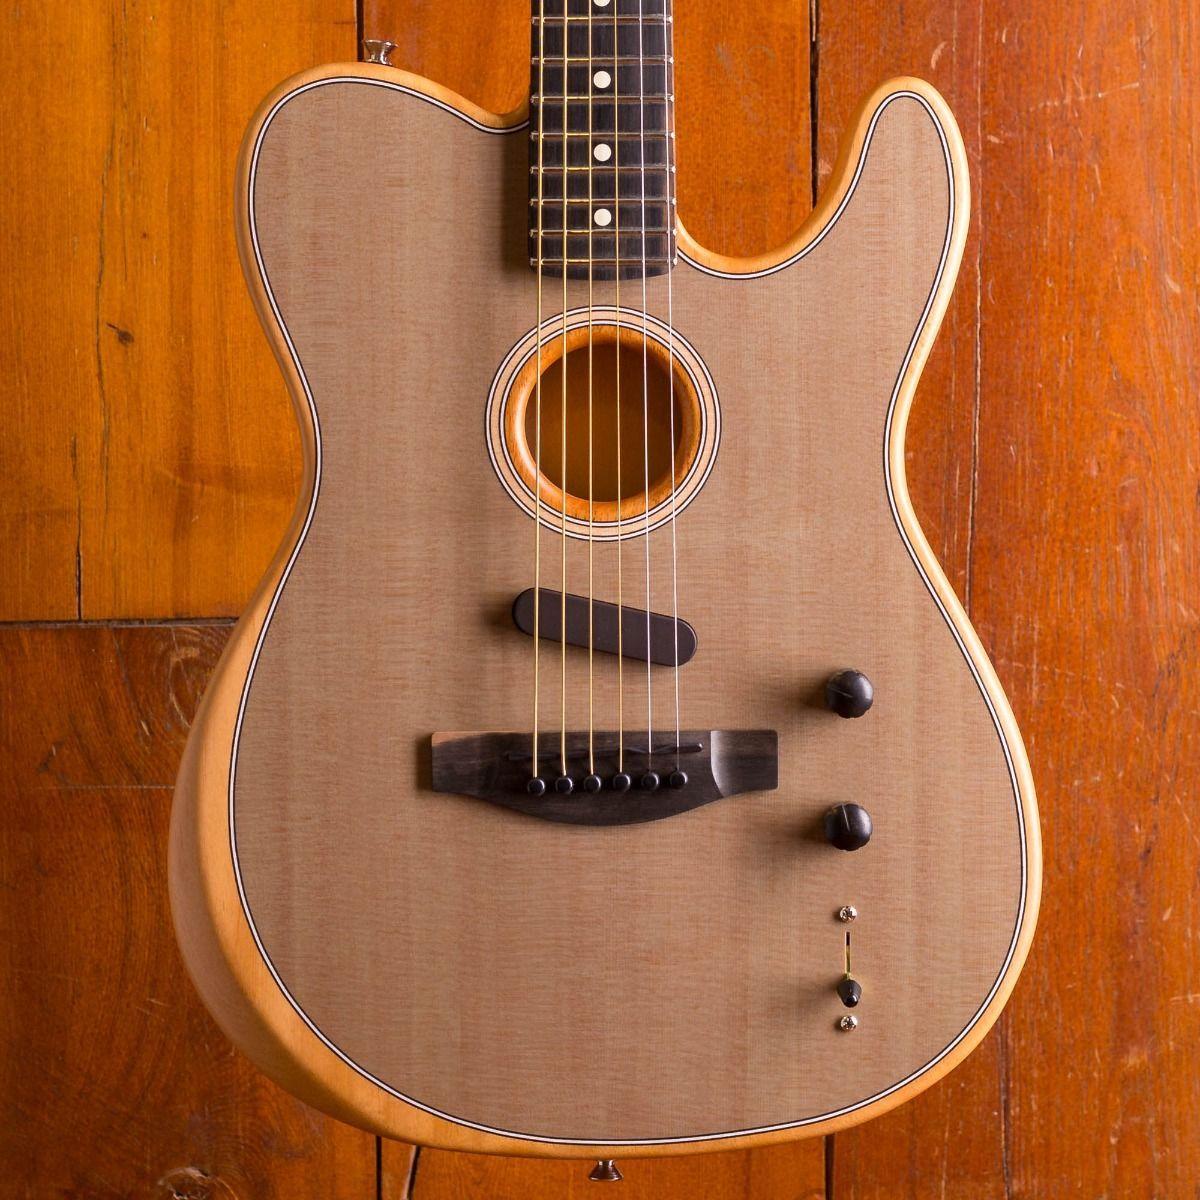 Custom Shop Acoustasonic Tele Sonic Grey Electric Guitar Polyester Satin Matte Finish, Spurce Top, Dot Inlay, Chrome Hardware